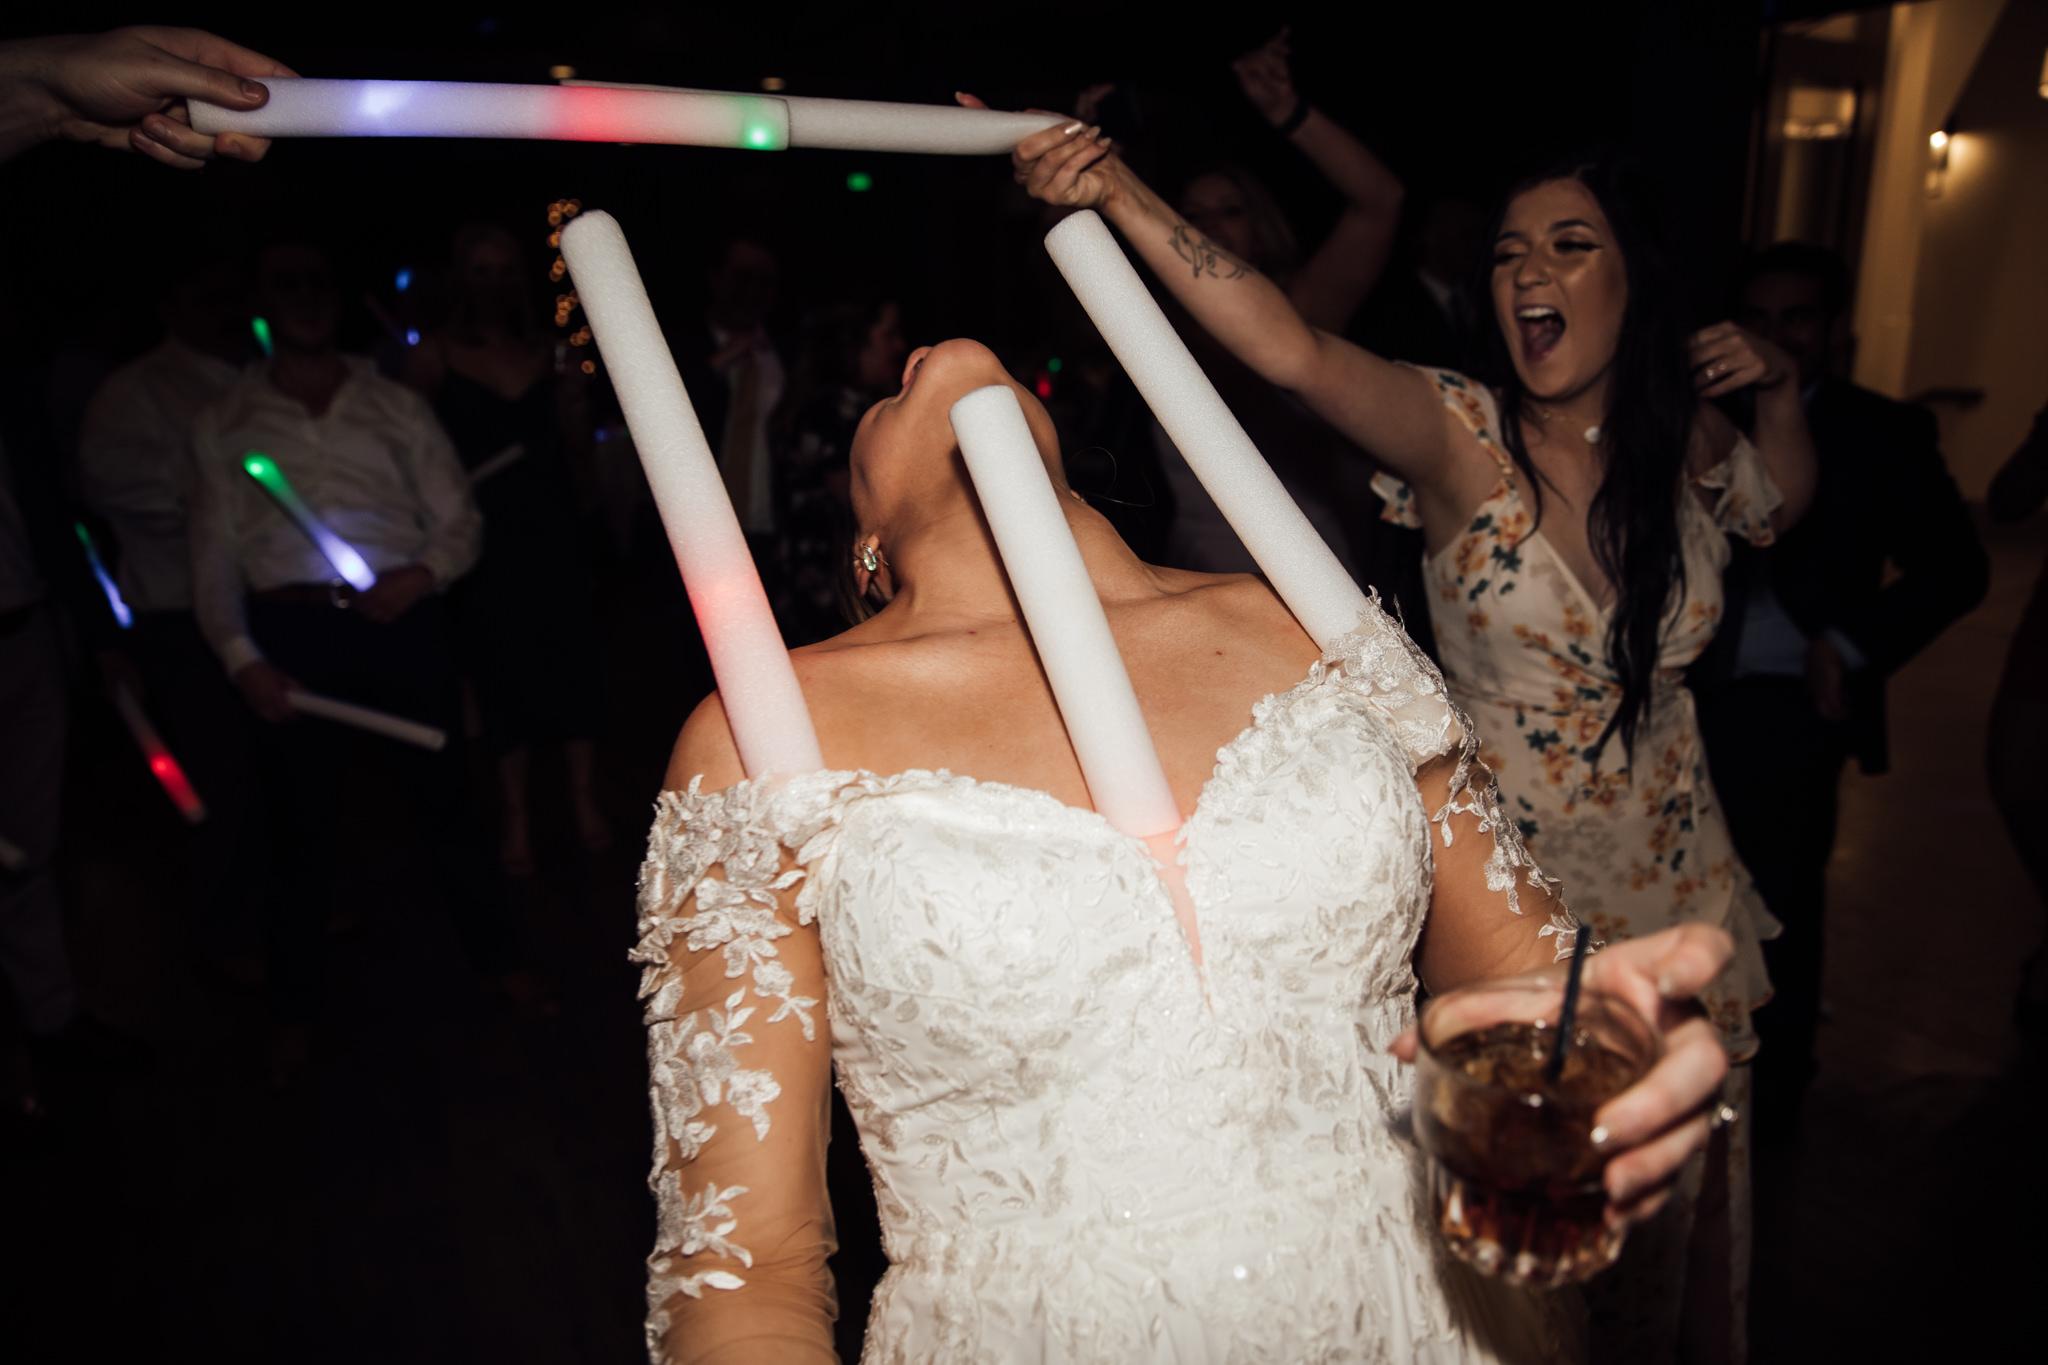 phantom-canyon-brewery-colorado-springs-wedding-photographer-20.jpg